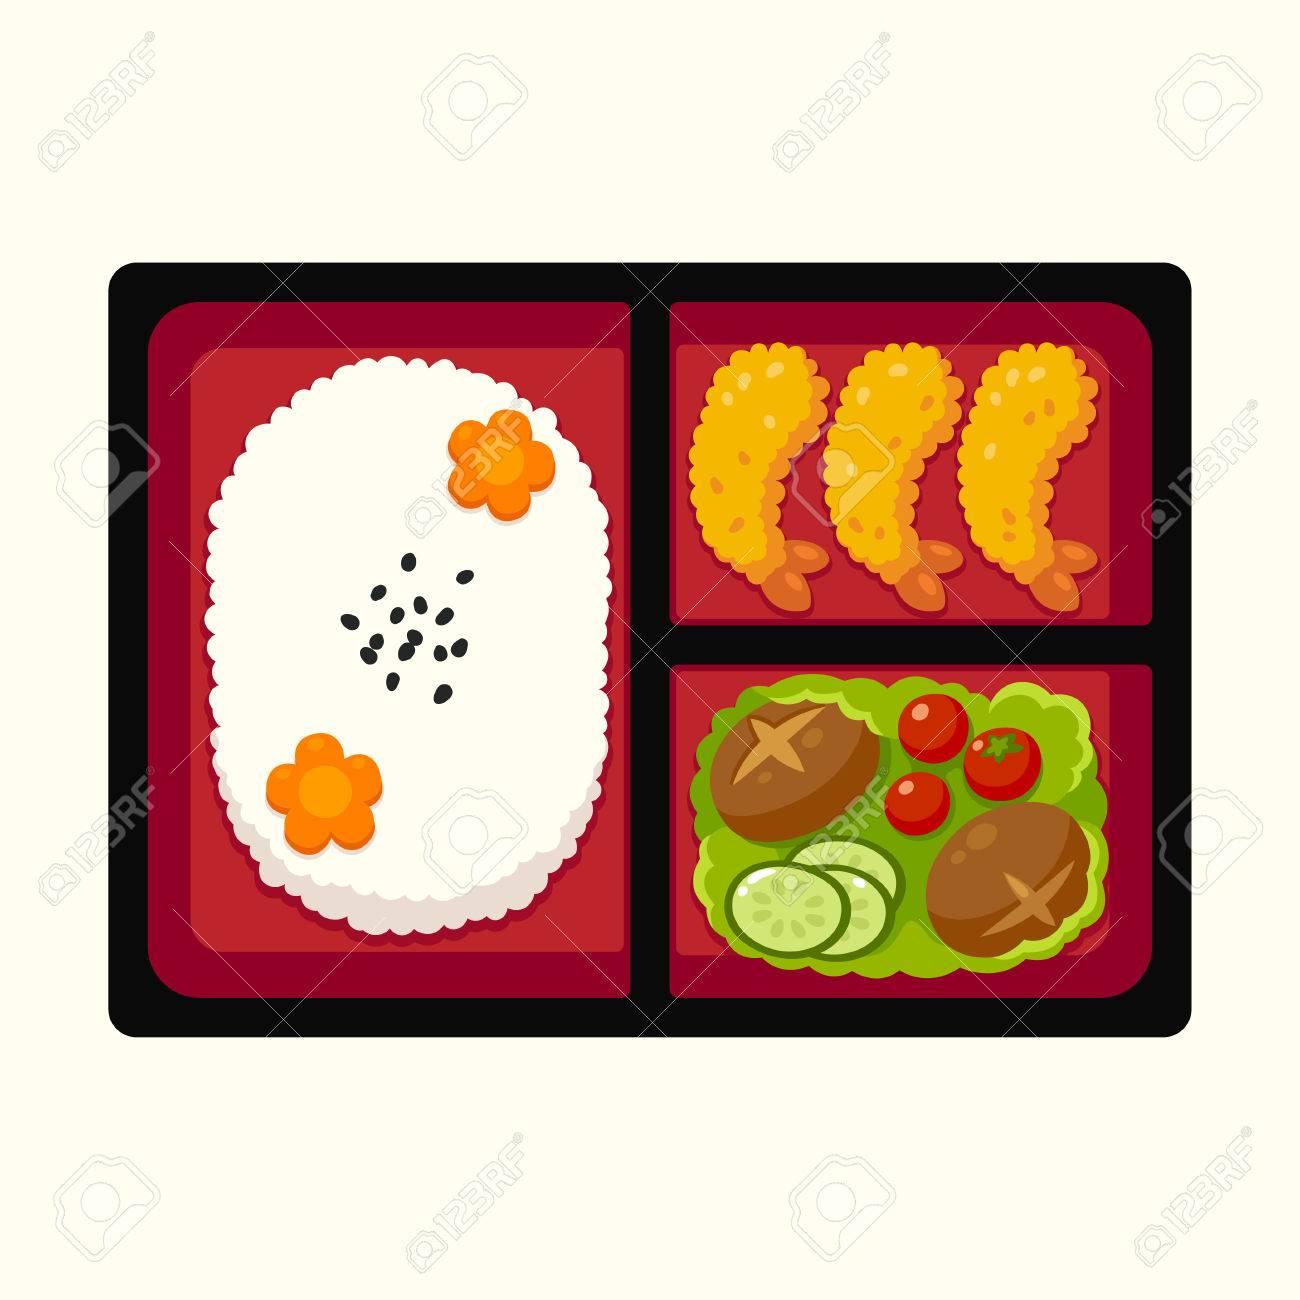 Traditional Japanese Bento Box Lunch With Rice Tempura Shrimp